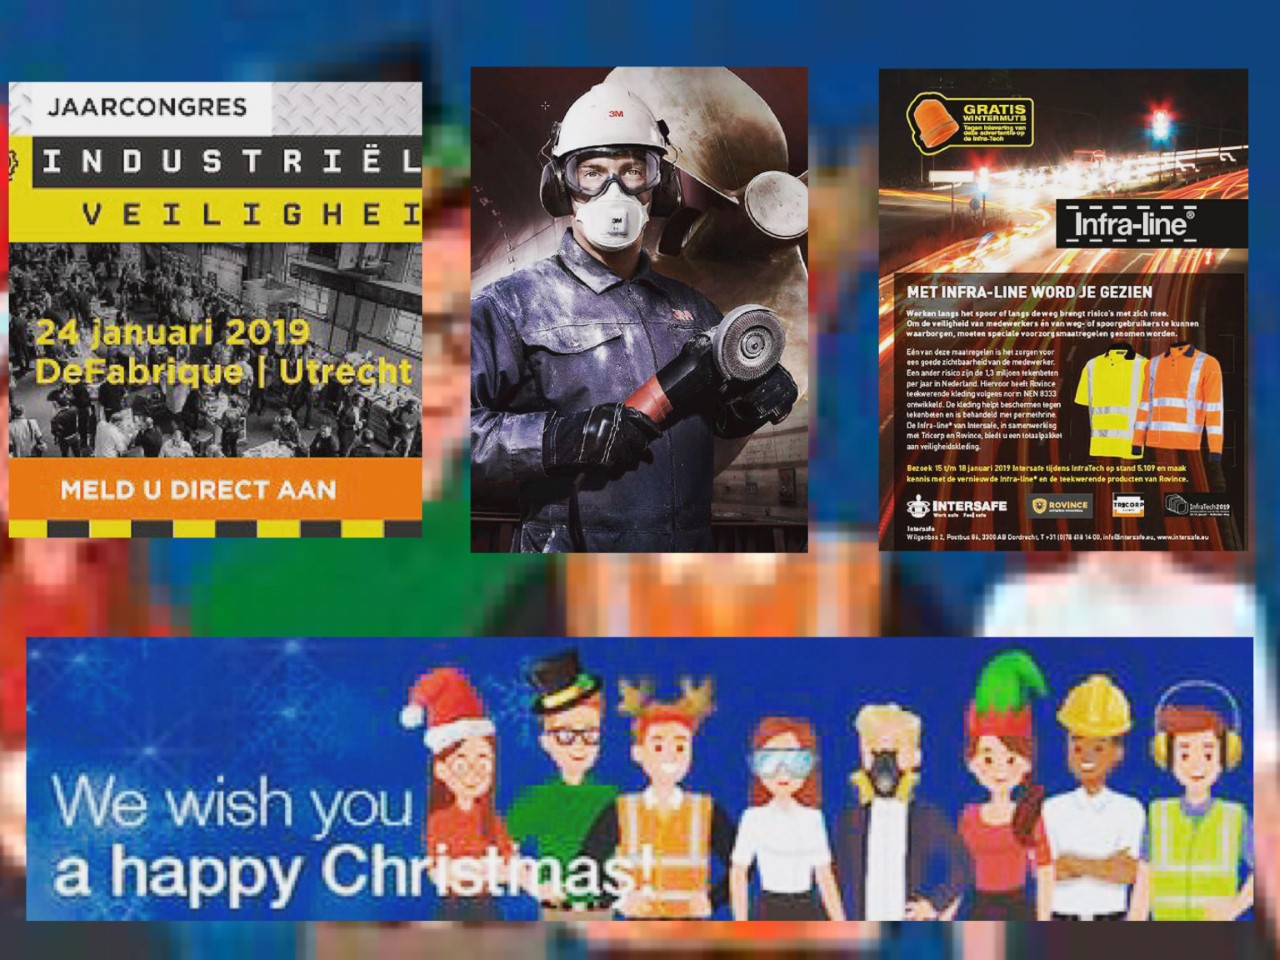 NIEUWSBRIEF: Merry Christmas - Teek Care!